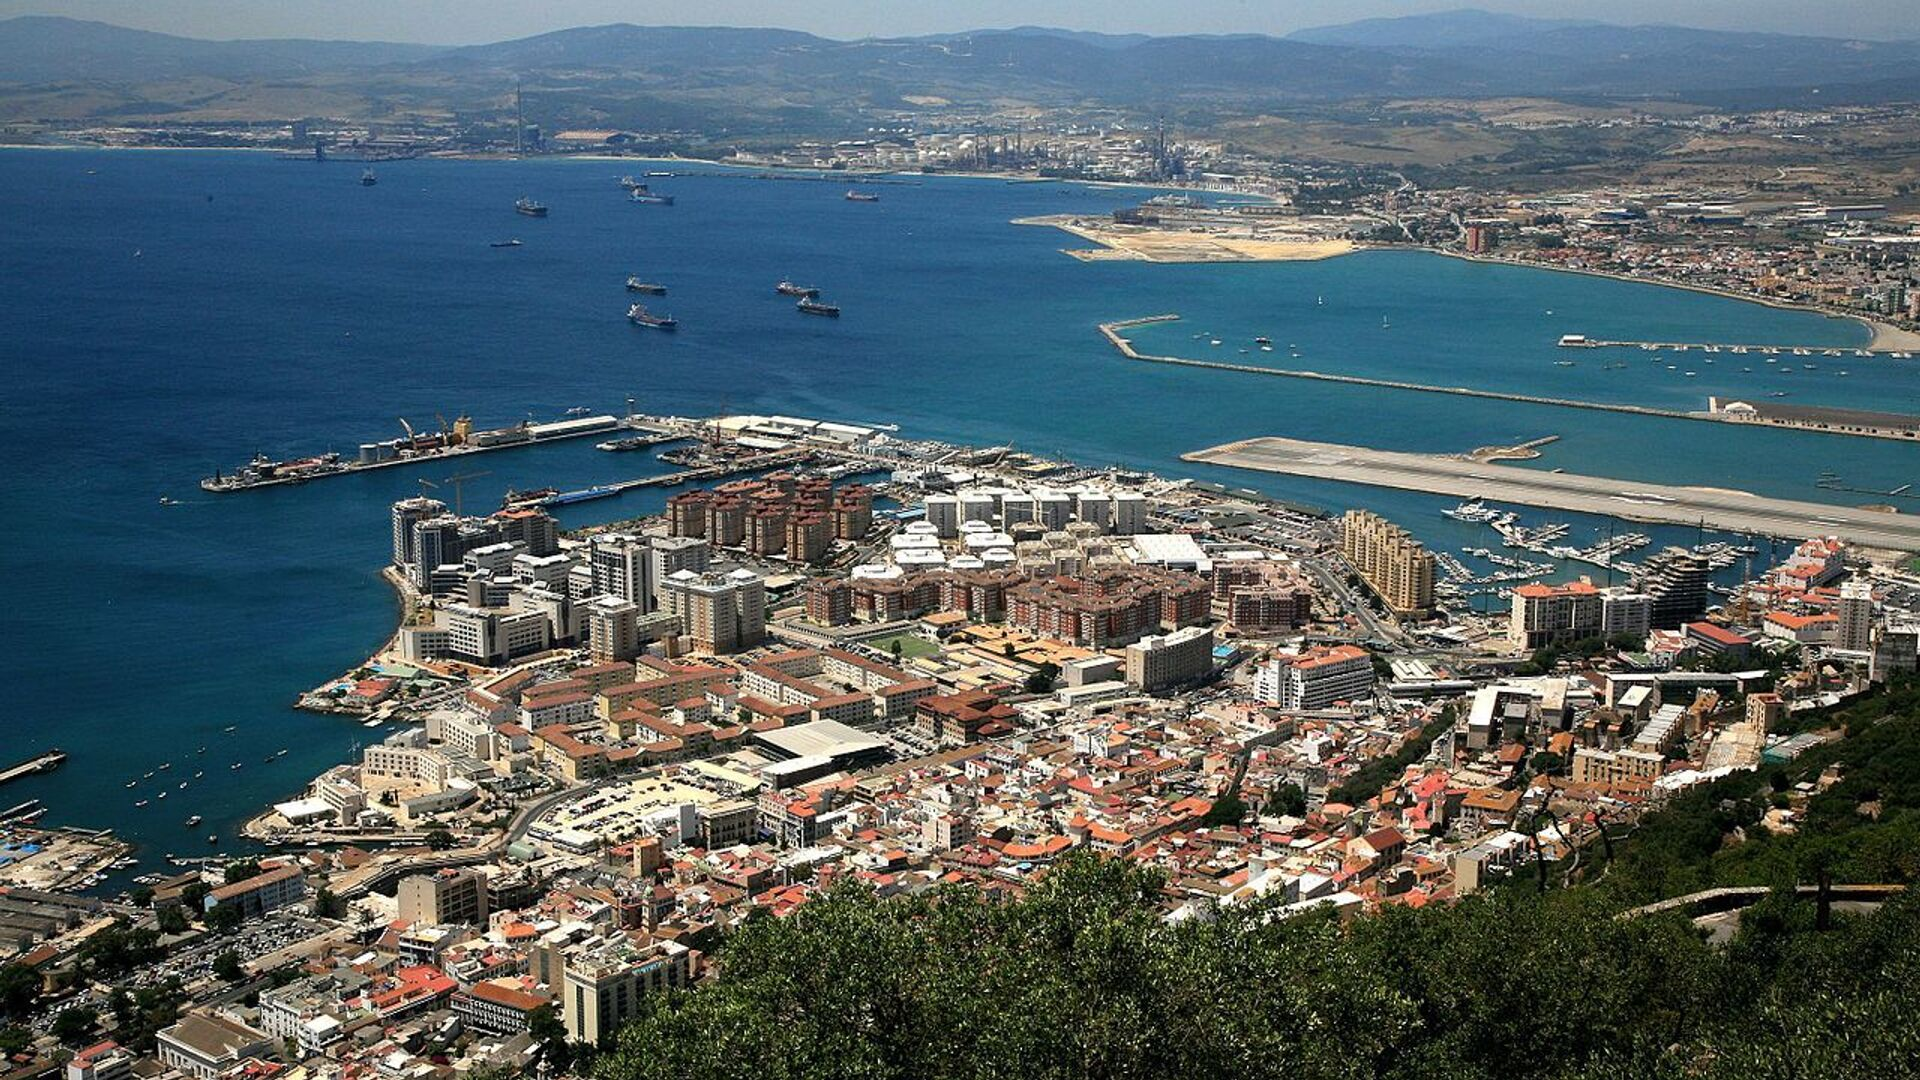 City of Gibraltar - Sputnik International, 1920, 05.10.2021